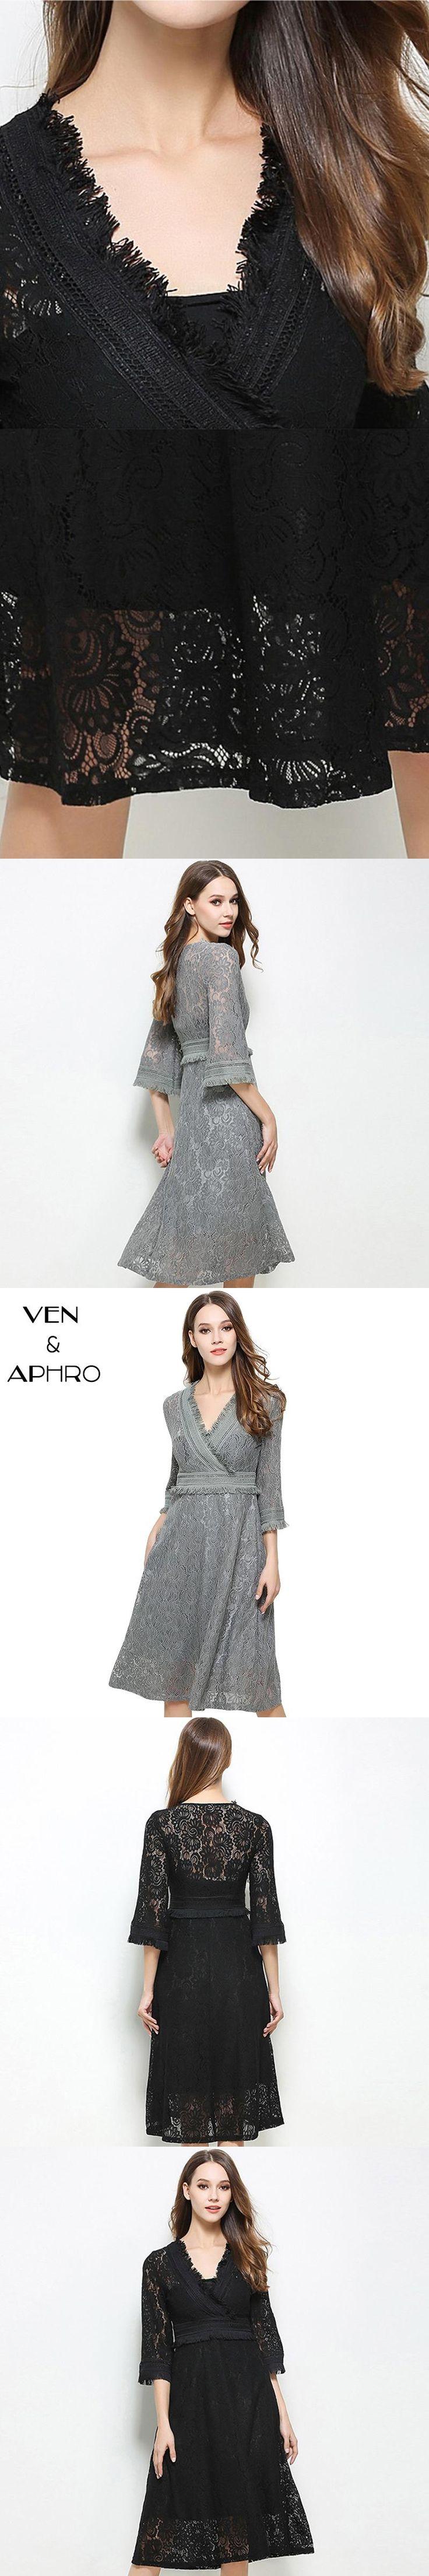 VA Lace Dress Women Autumn Winter vestidos Party Dresses Perspective Long Slim V Neck Dresses Vintage Dress Grey Black W00923